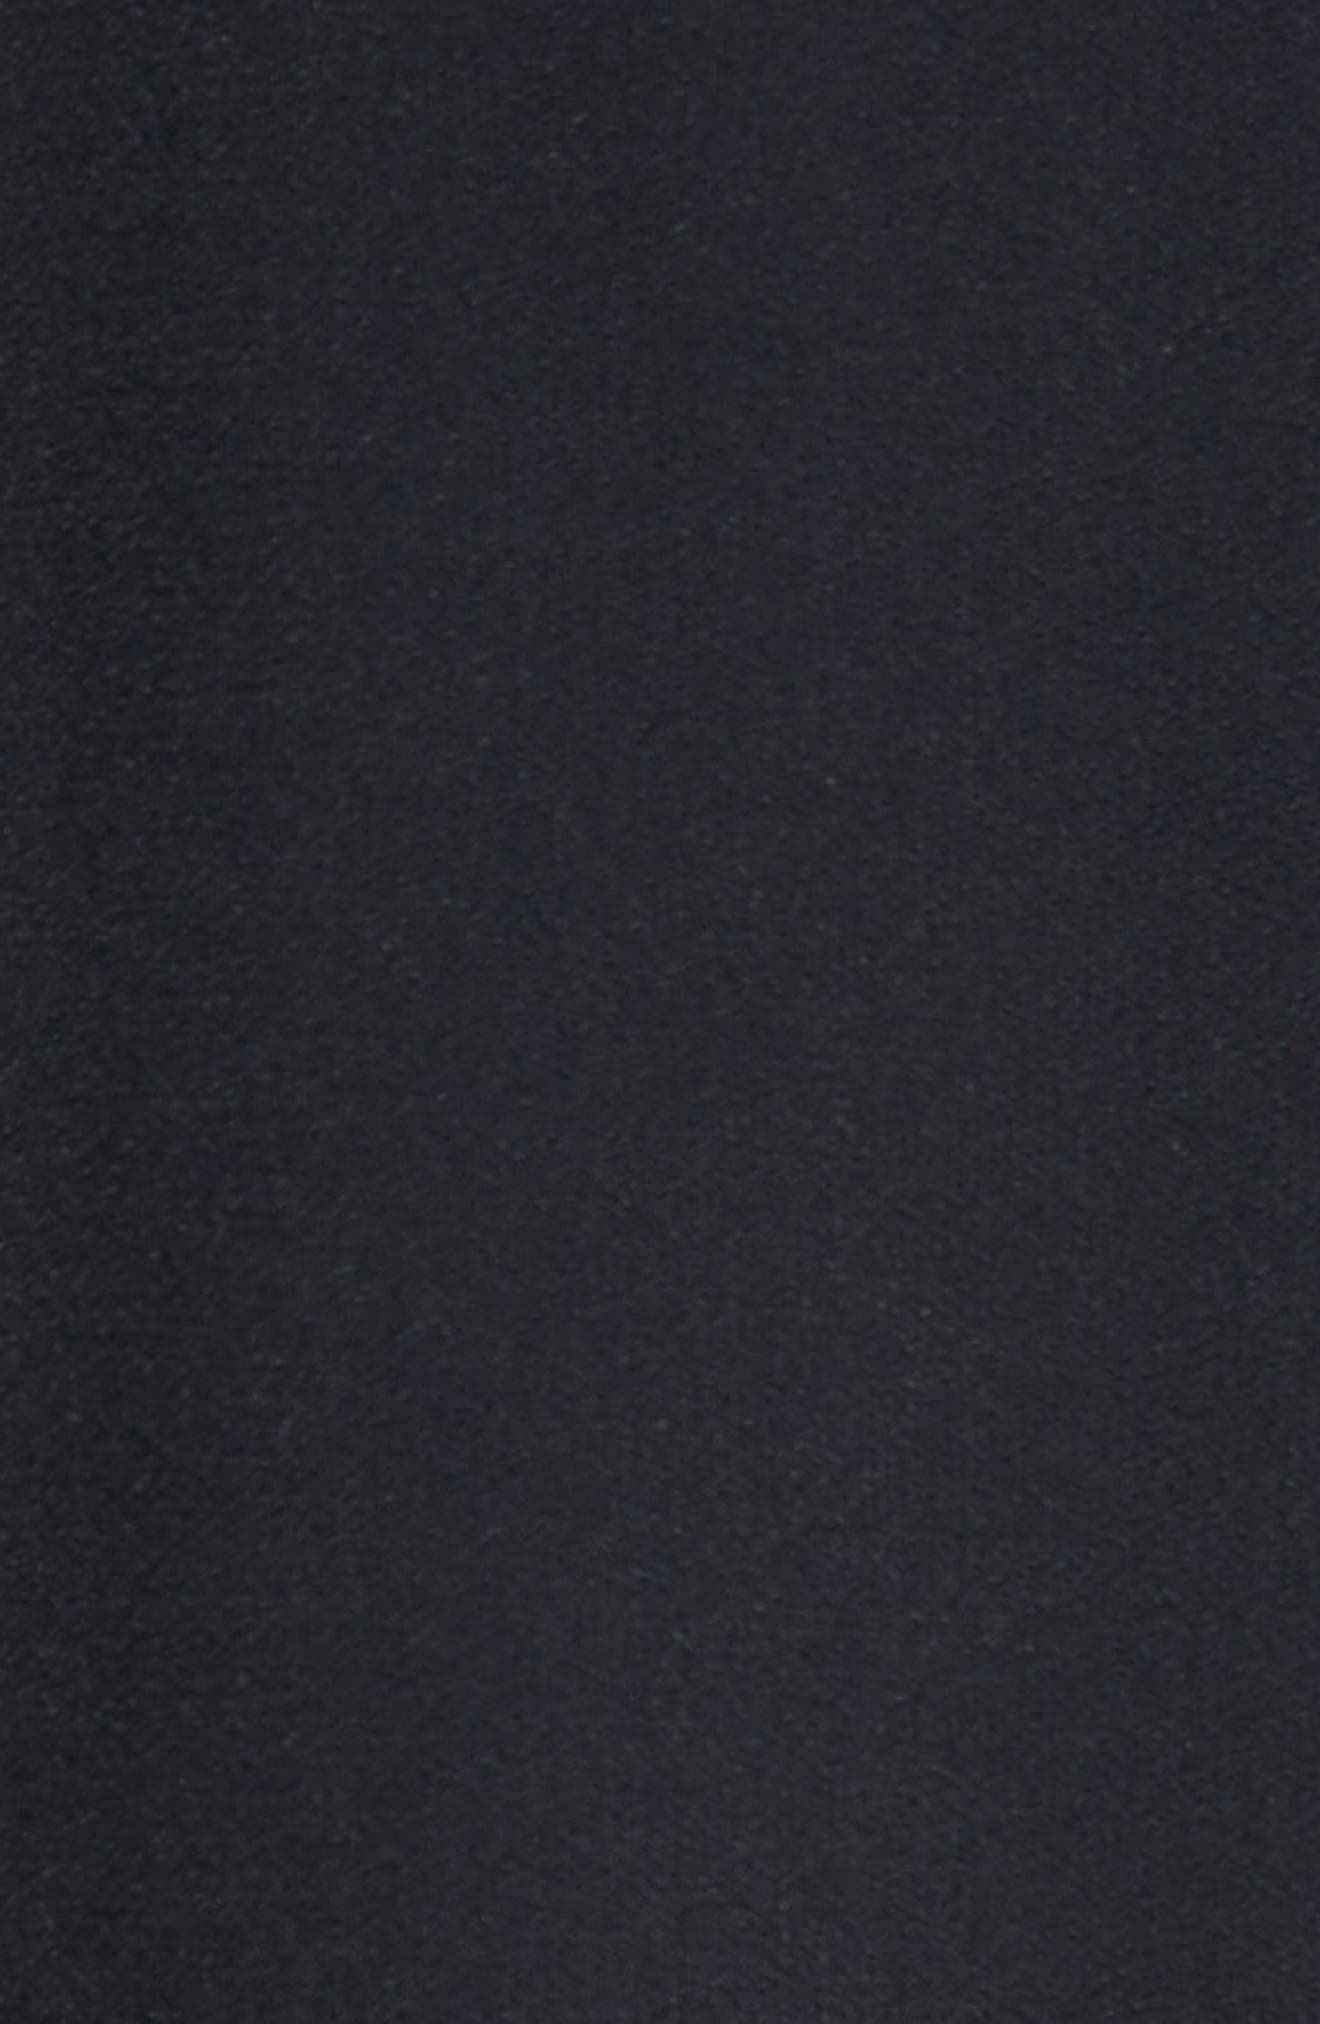 Ruffle Satin Backed Crepe Dress,                             Alternate thumbnail 5, color,